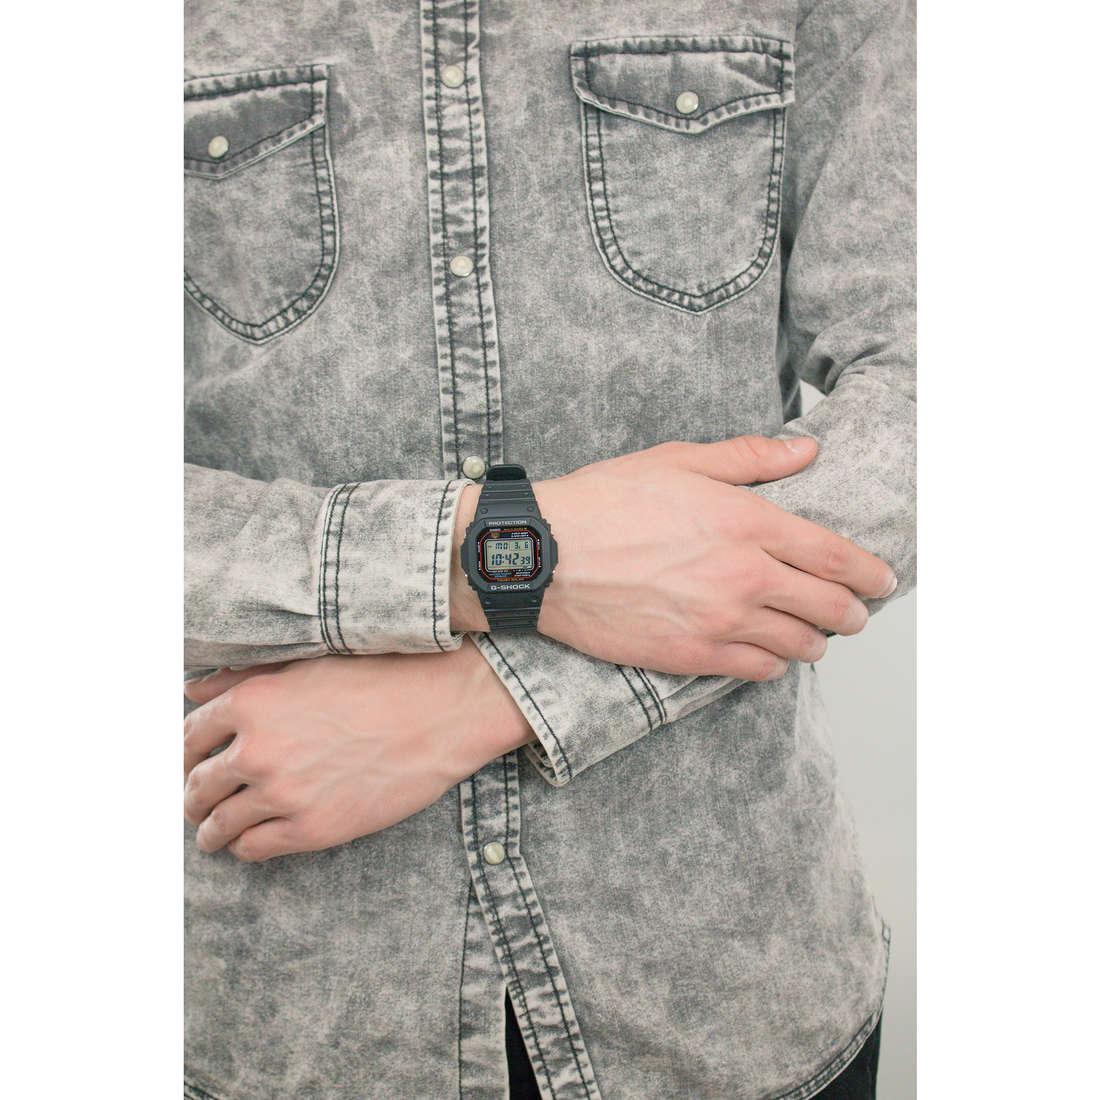 Casio digitali G-Shock uomo GW-M5610-1ER indosso